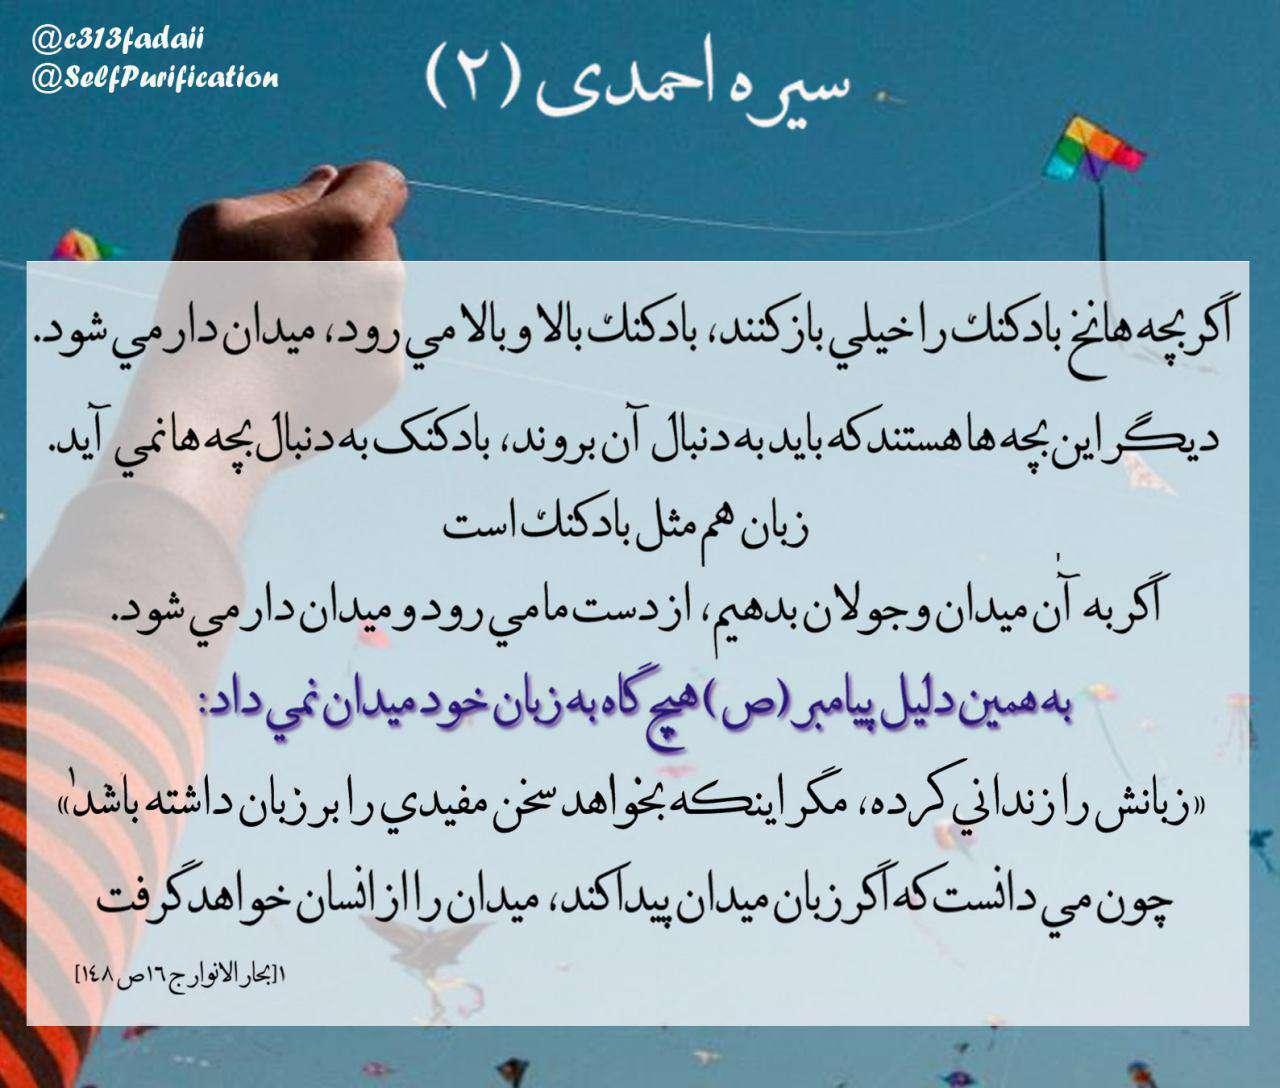 photo 2015 12 29 22 39 43 زندانی کننده زبان